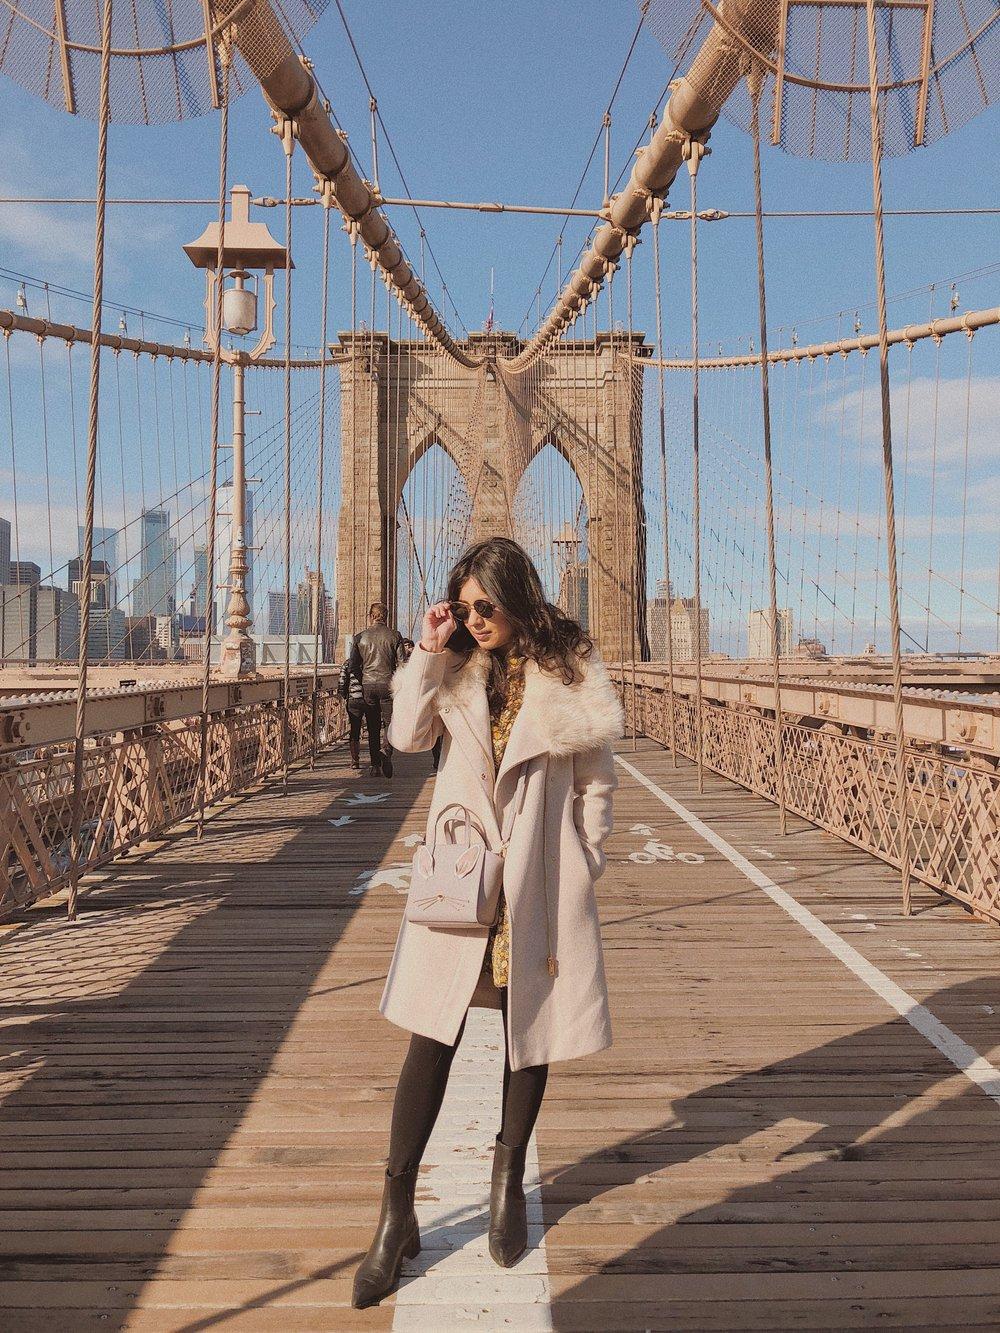 brooklyn-bridge-dumbo-travel